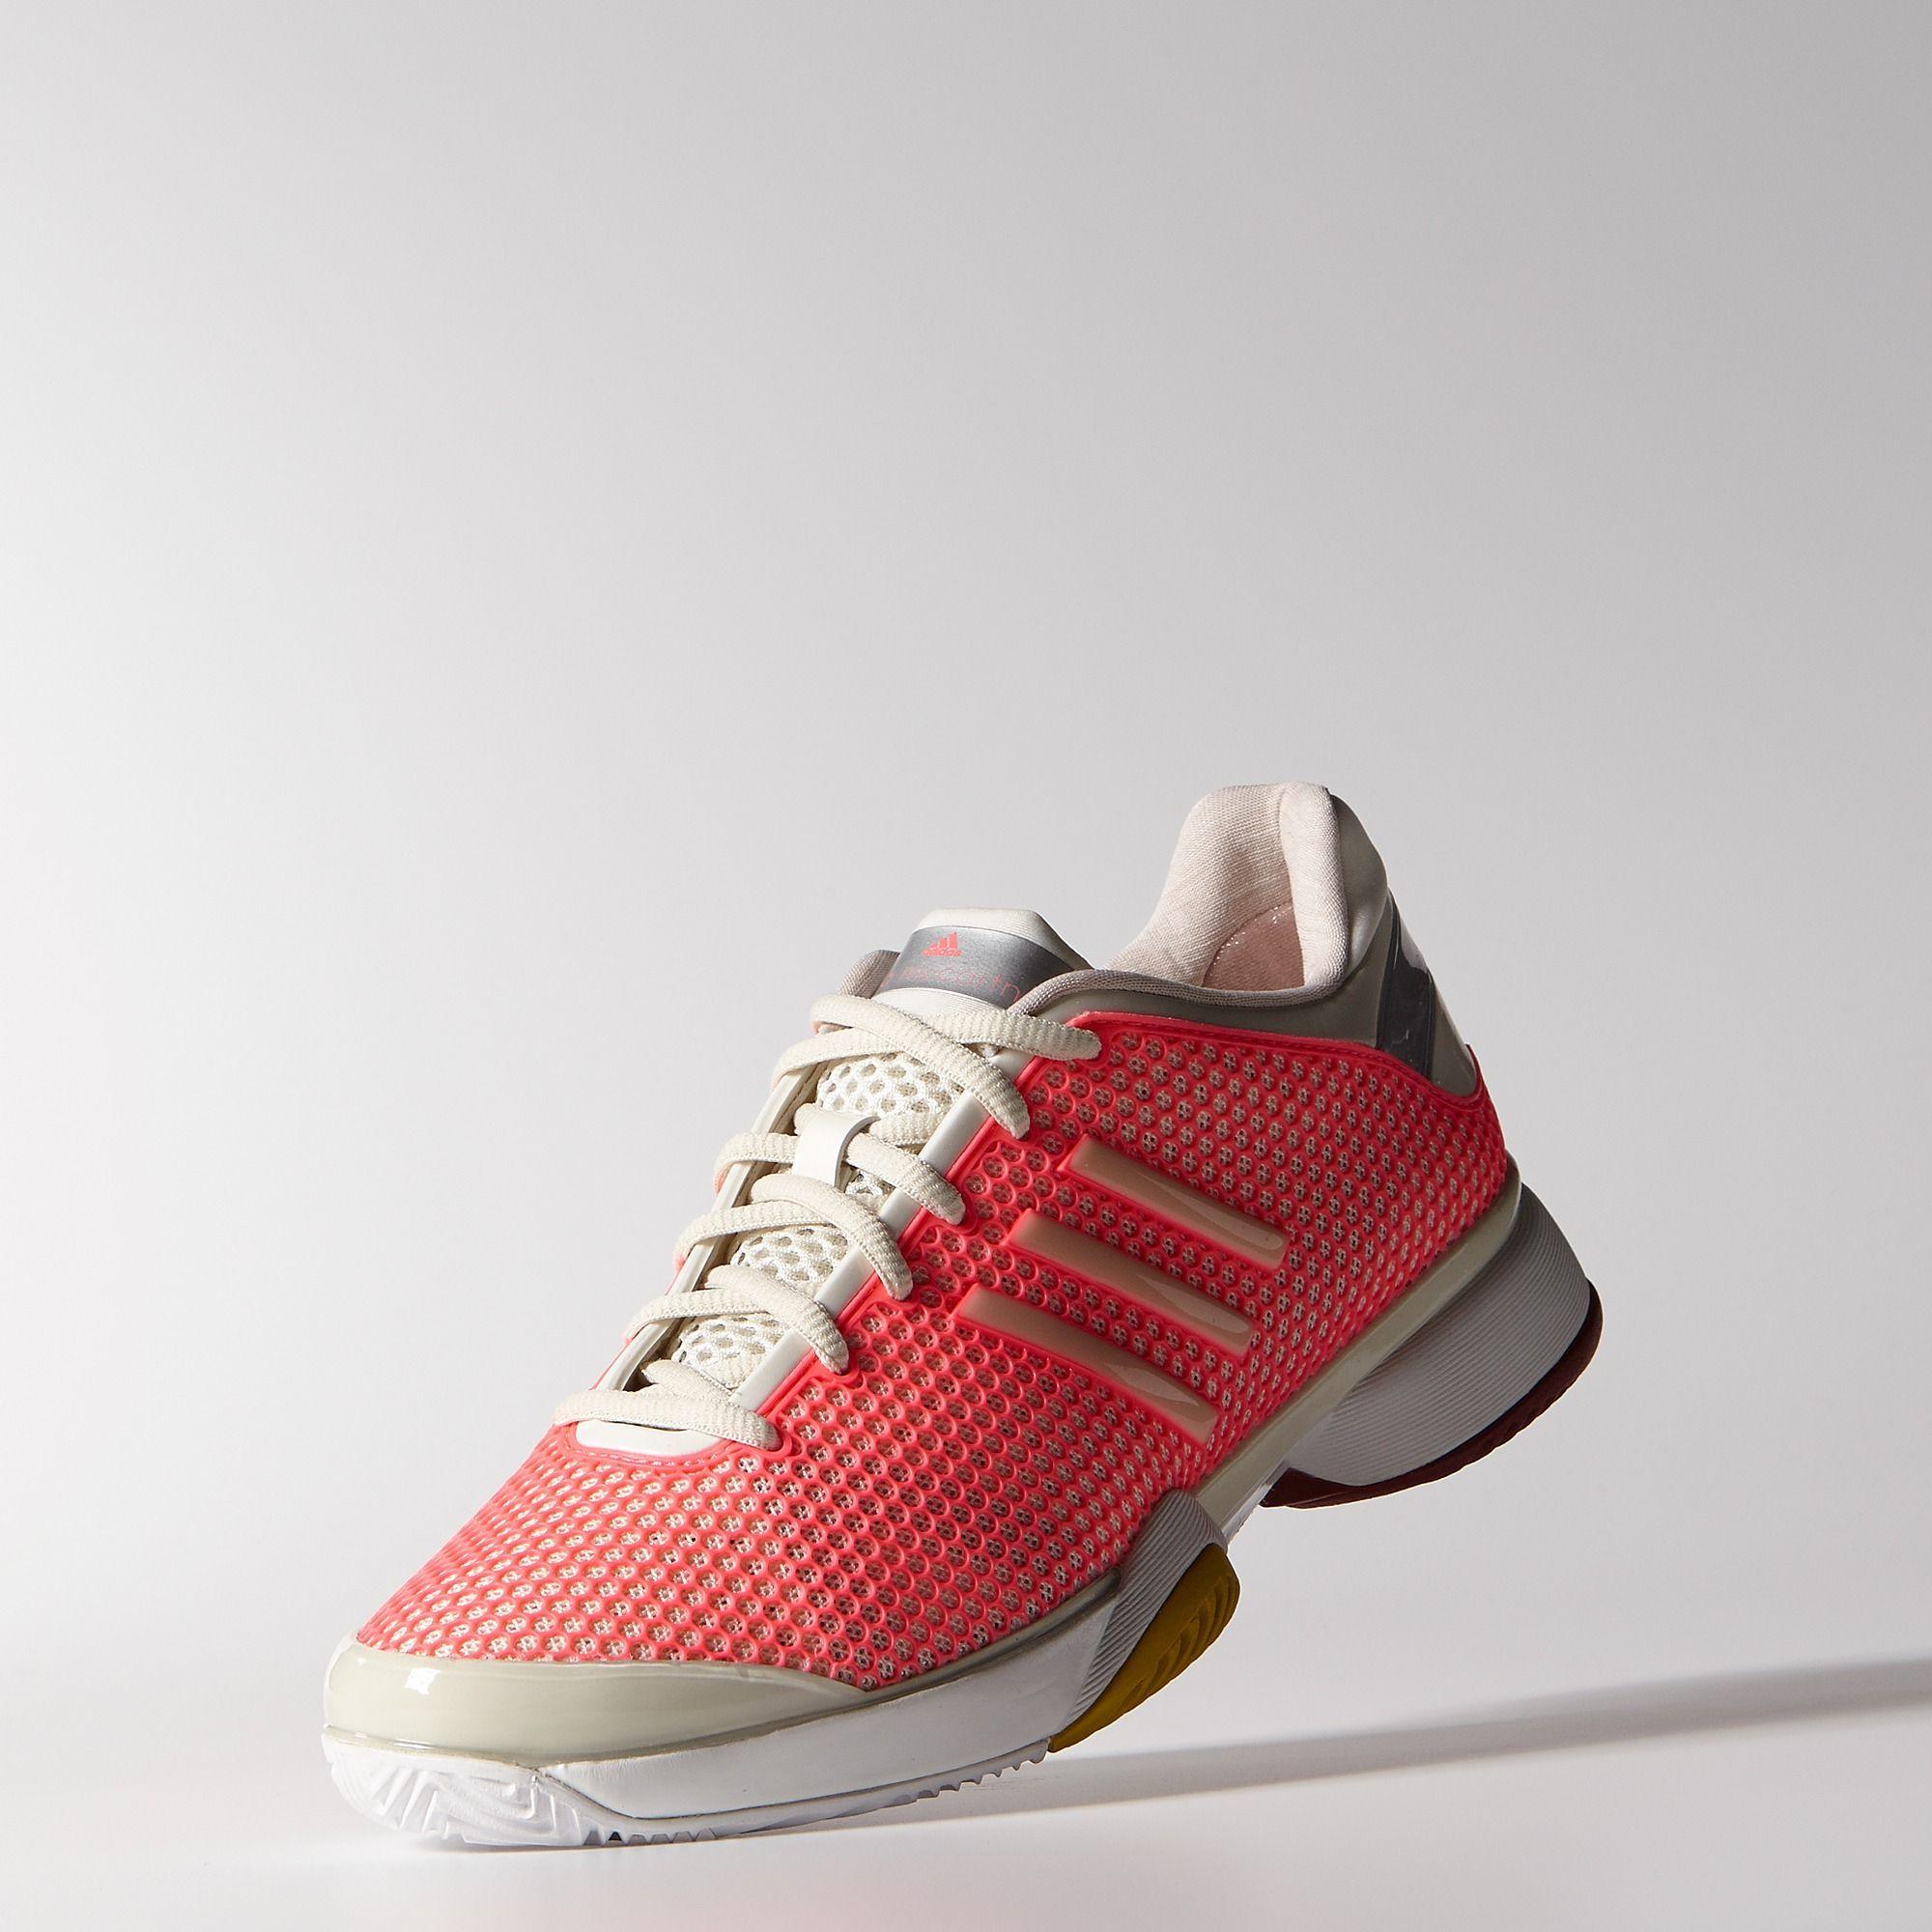 adidas, stella mccartney barricata scarpe fitness amore